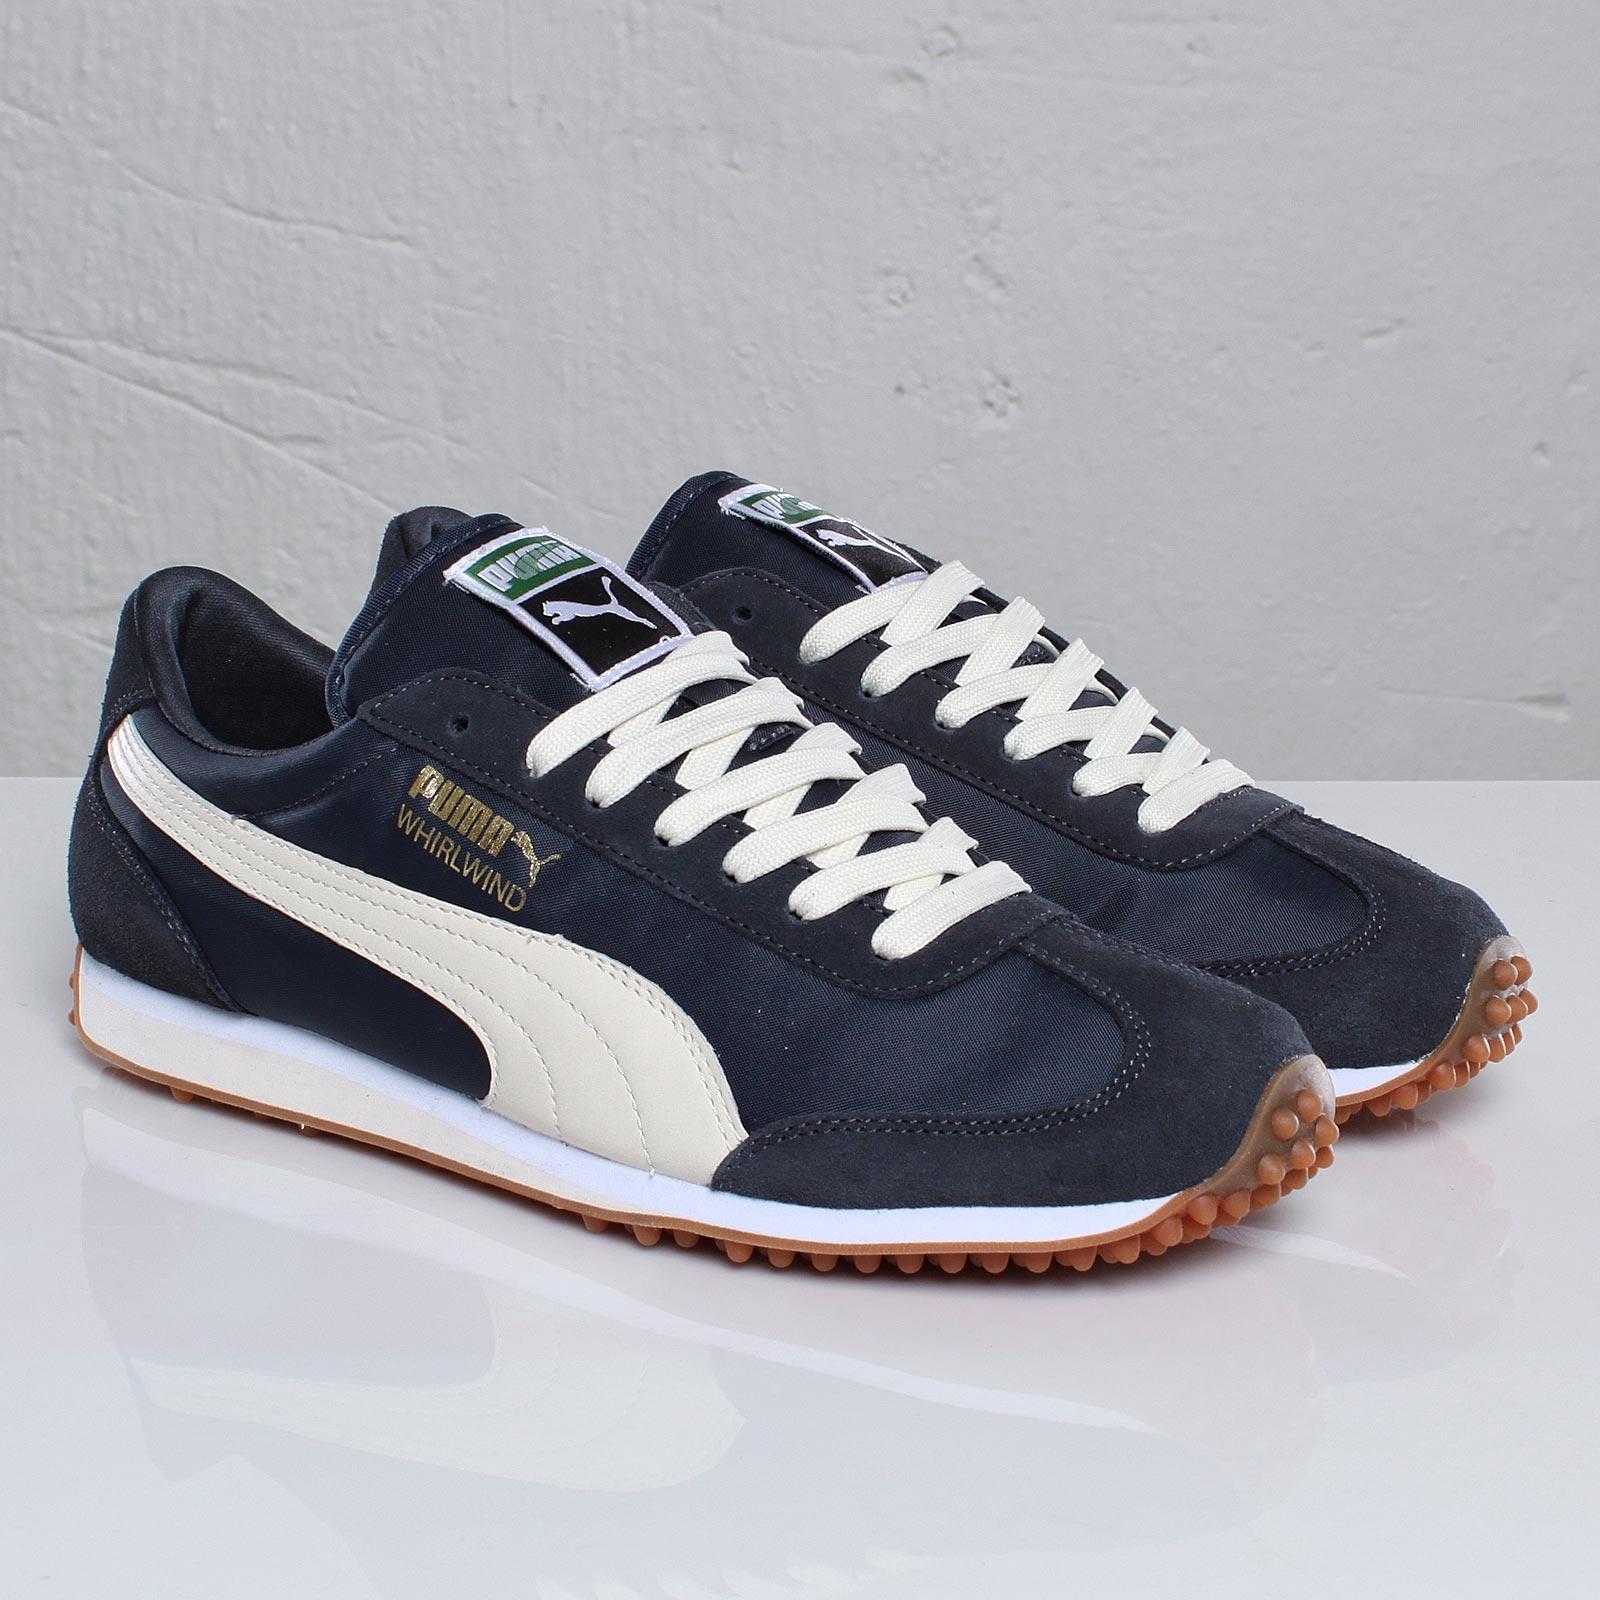 3318fb2ff4f525 Puma Whirlwind Classic - 100610 - Sneakersnstuff